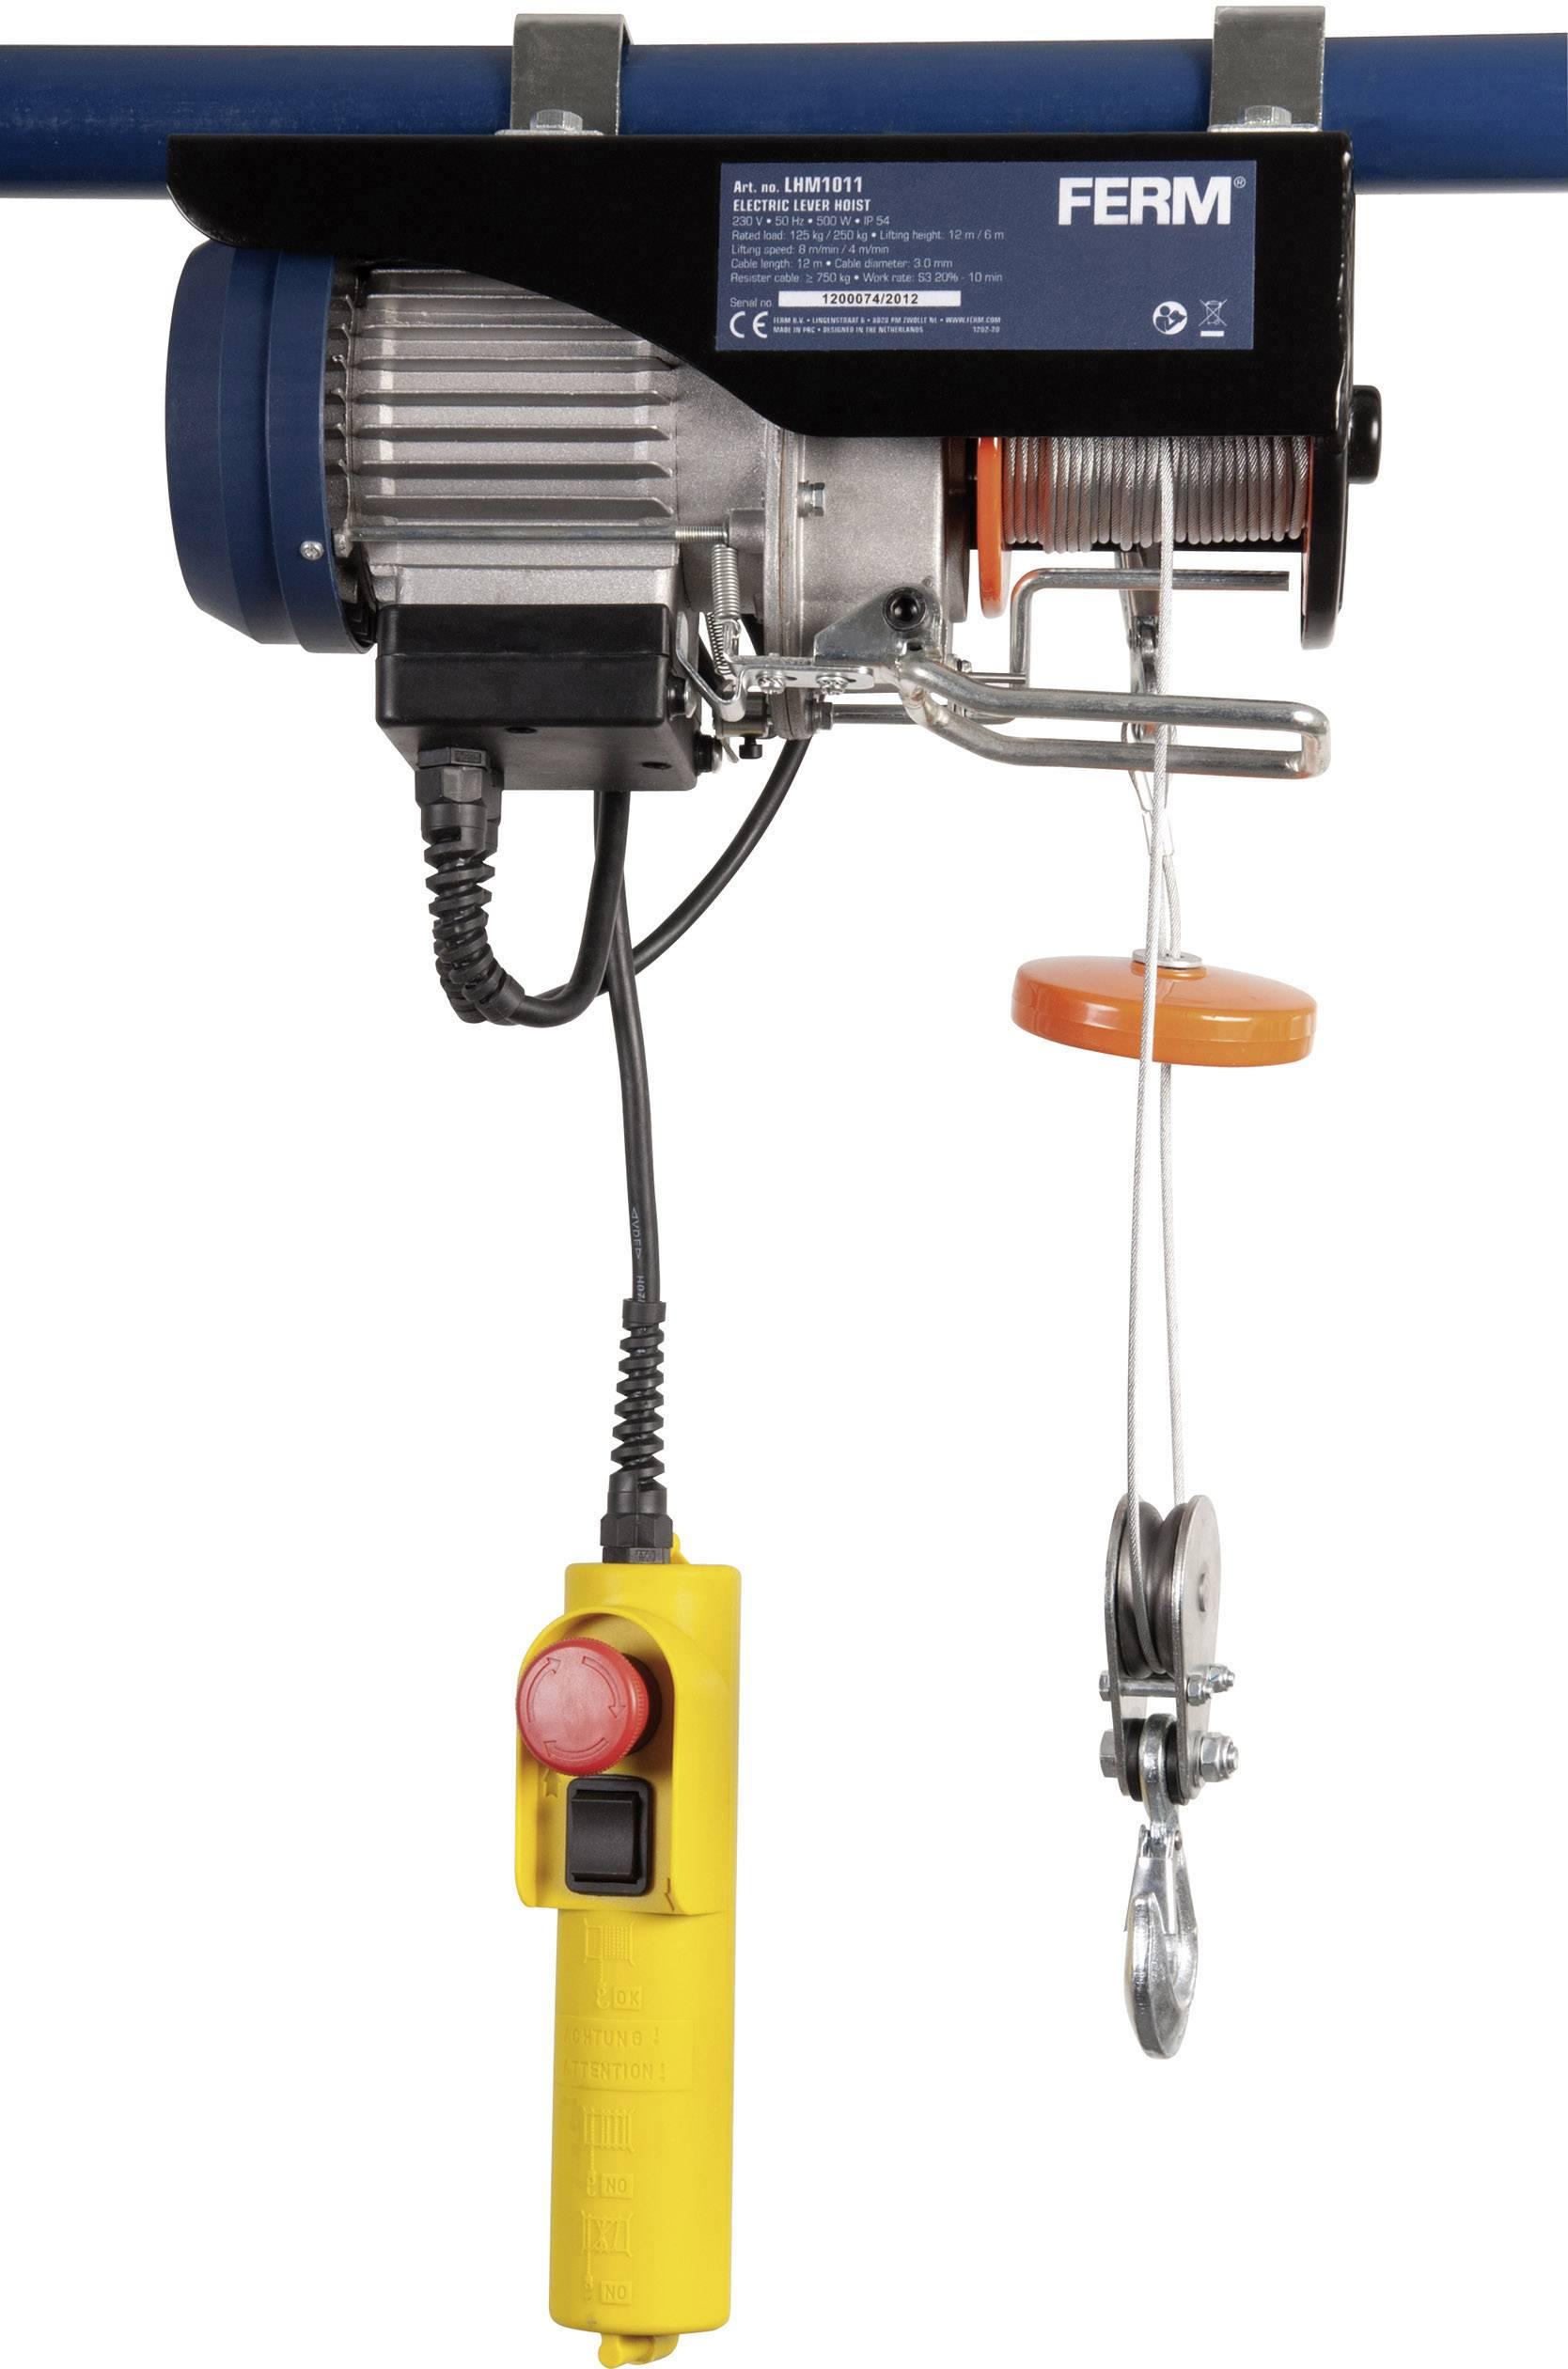 Elektrický lanový kladkostroj Ferm LHM1011, 125 kg/250 kg, zdvih 12/6